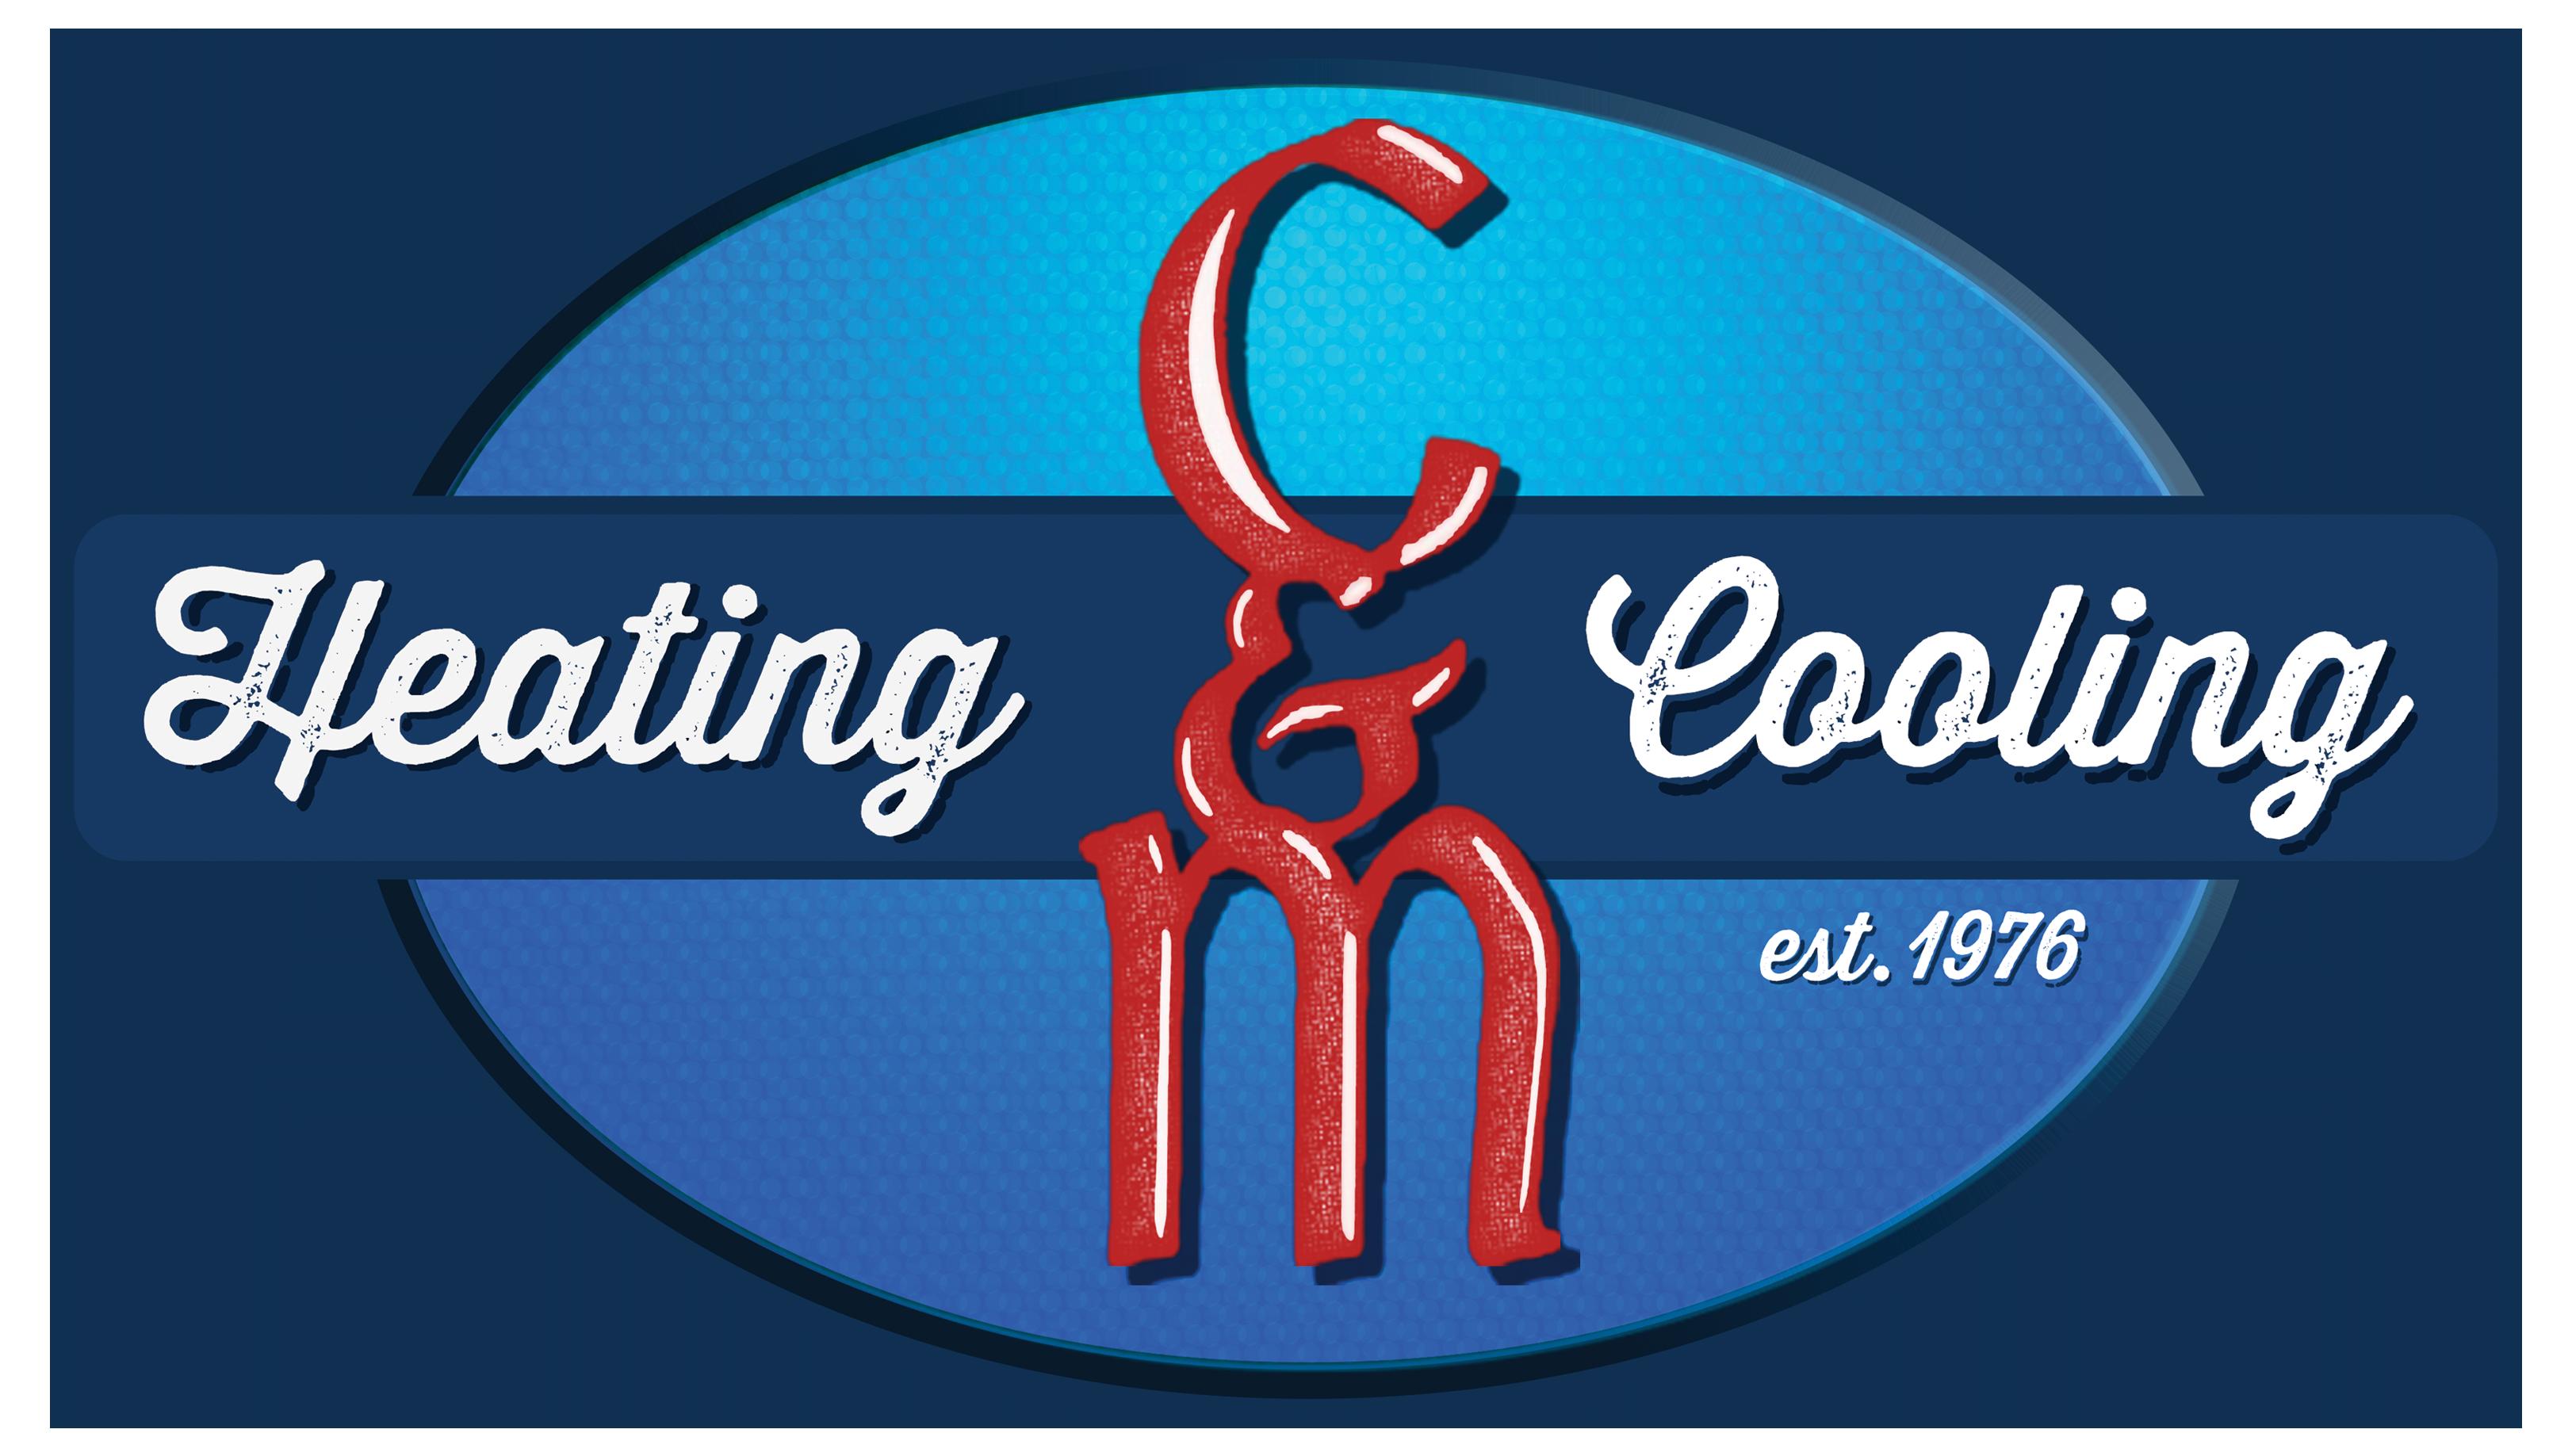 C & M Heating & Cooling / Franklin